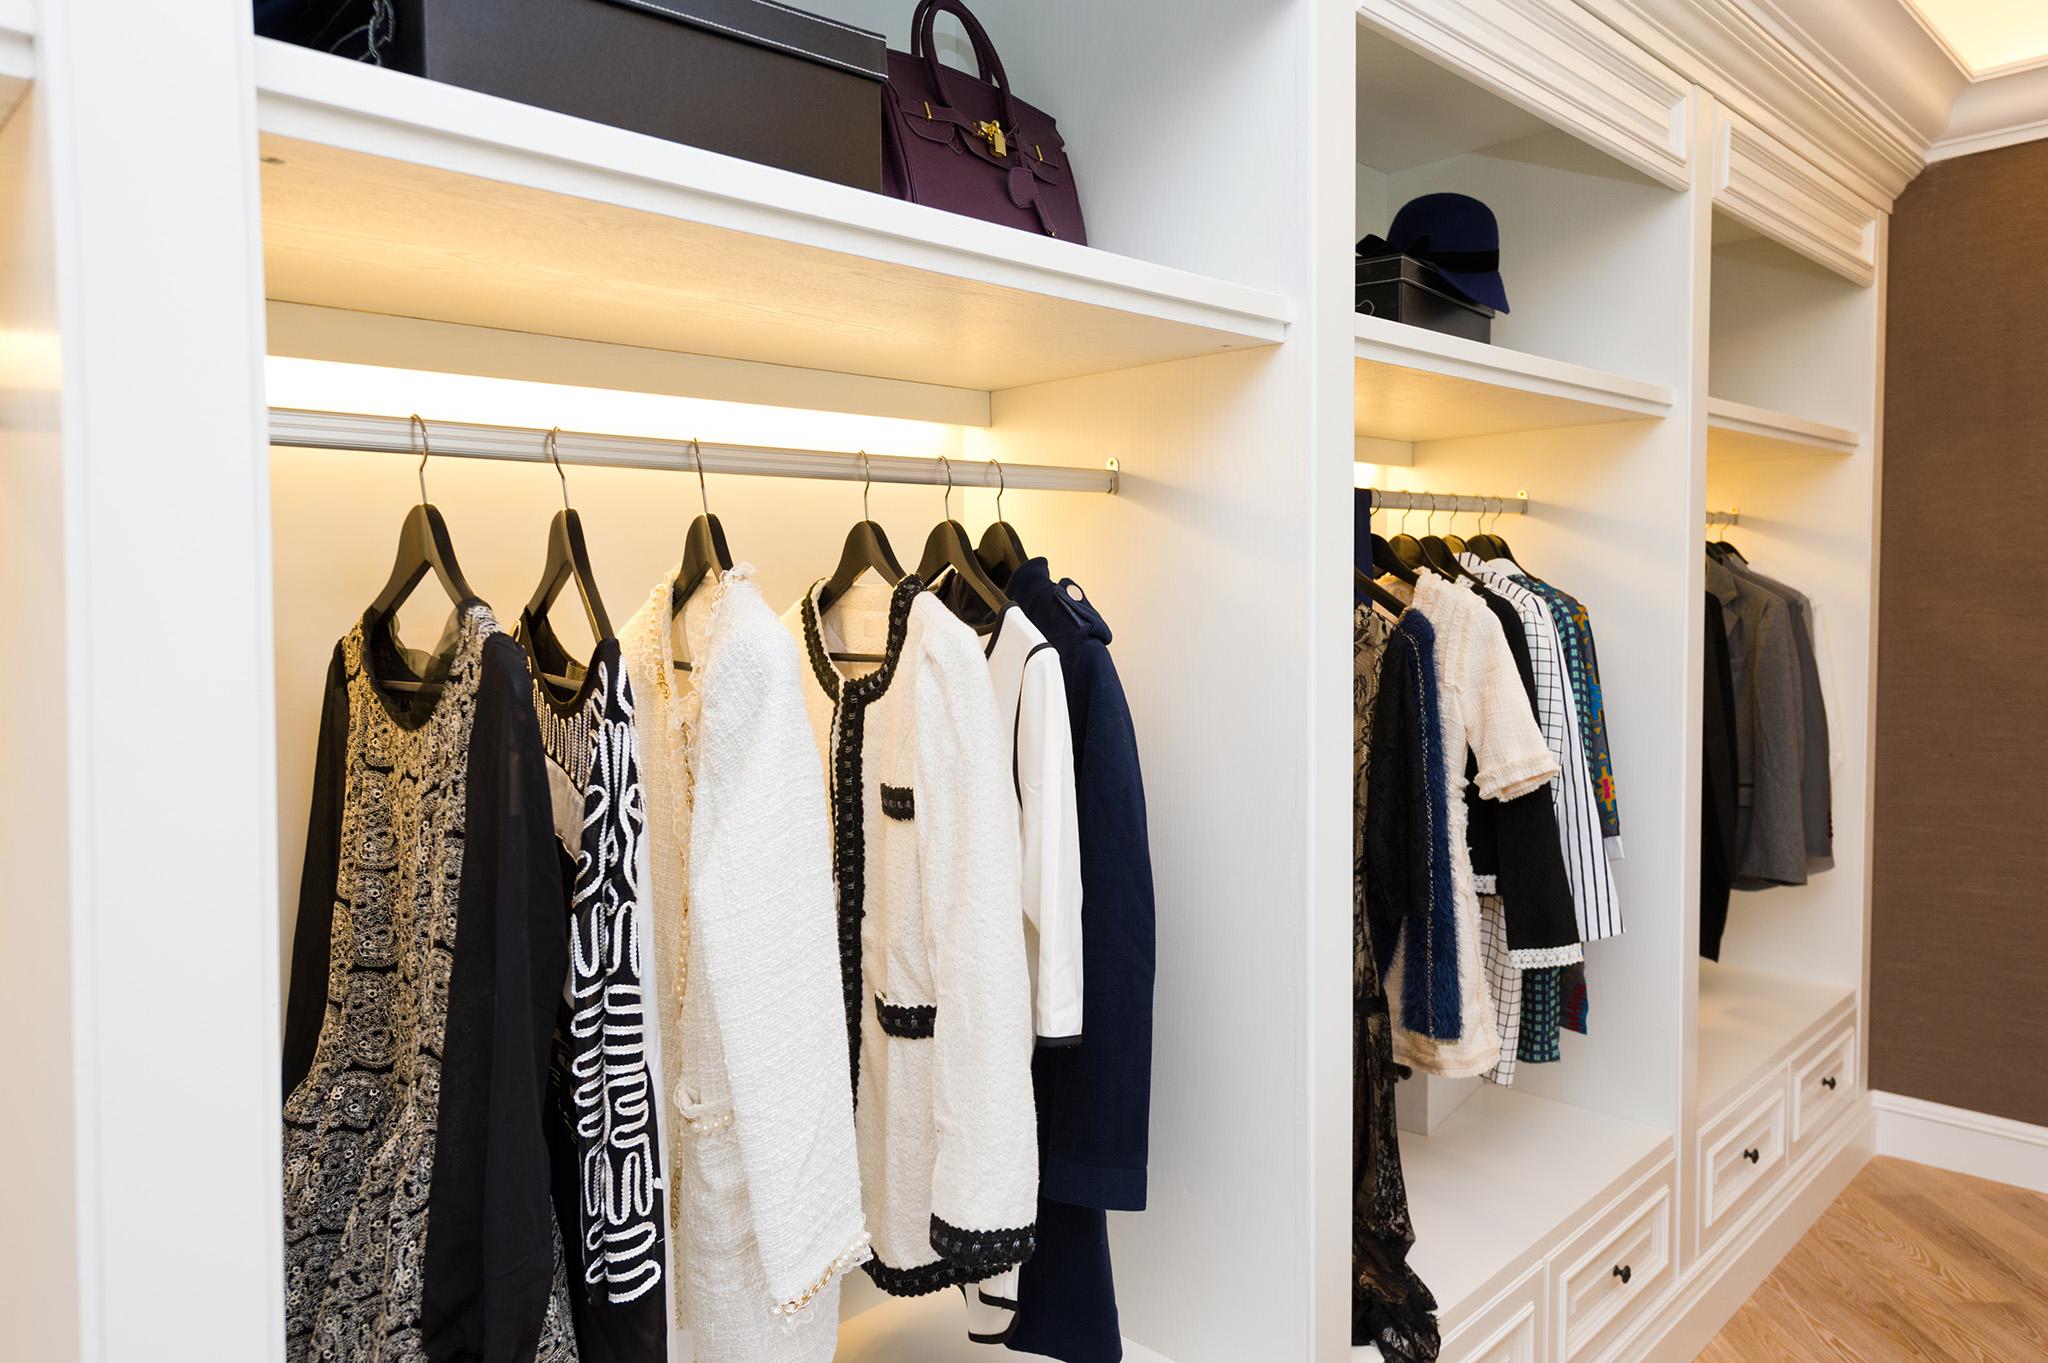 walk in wardrobe, built in wardrobe, wardrobe hanging storage